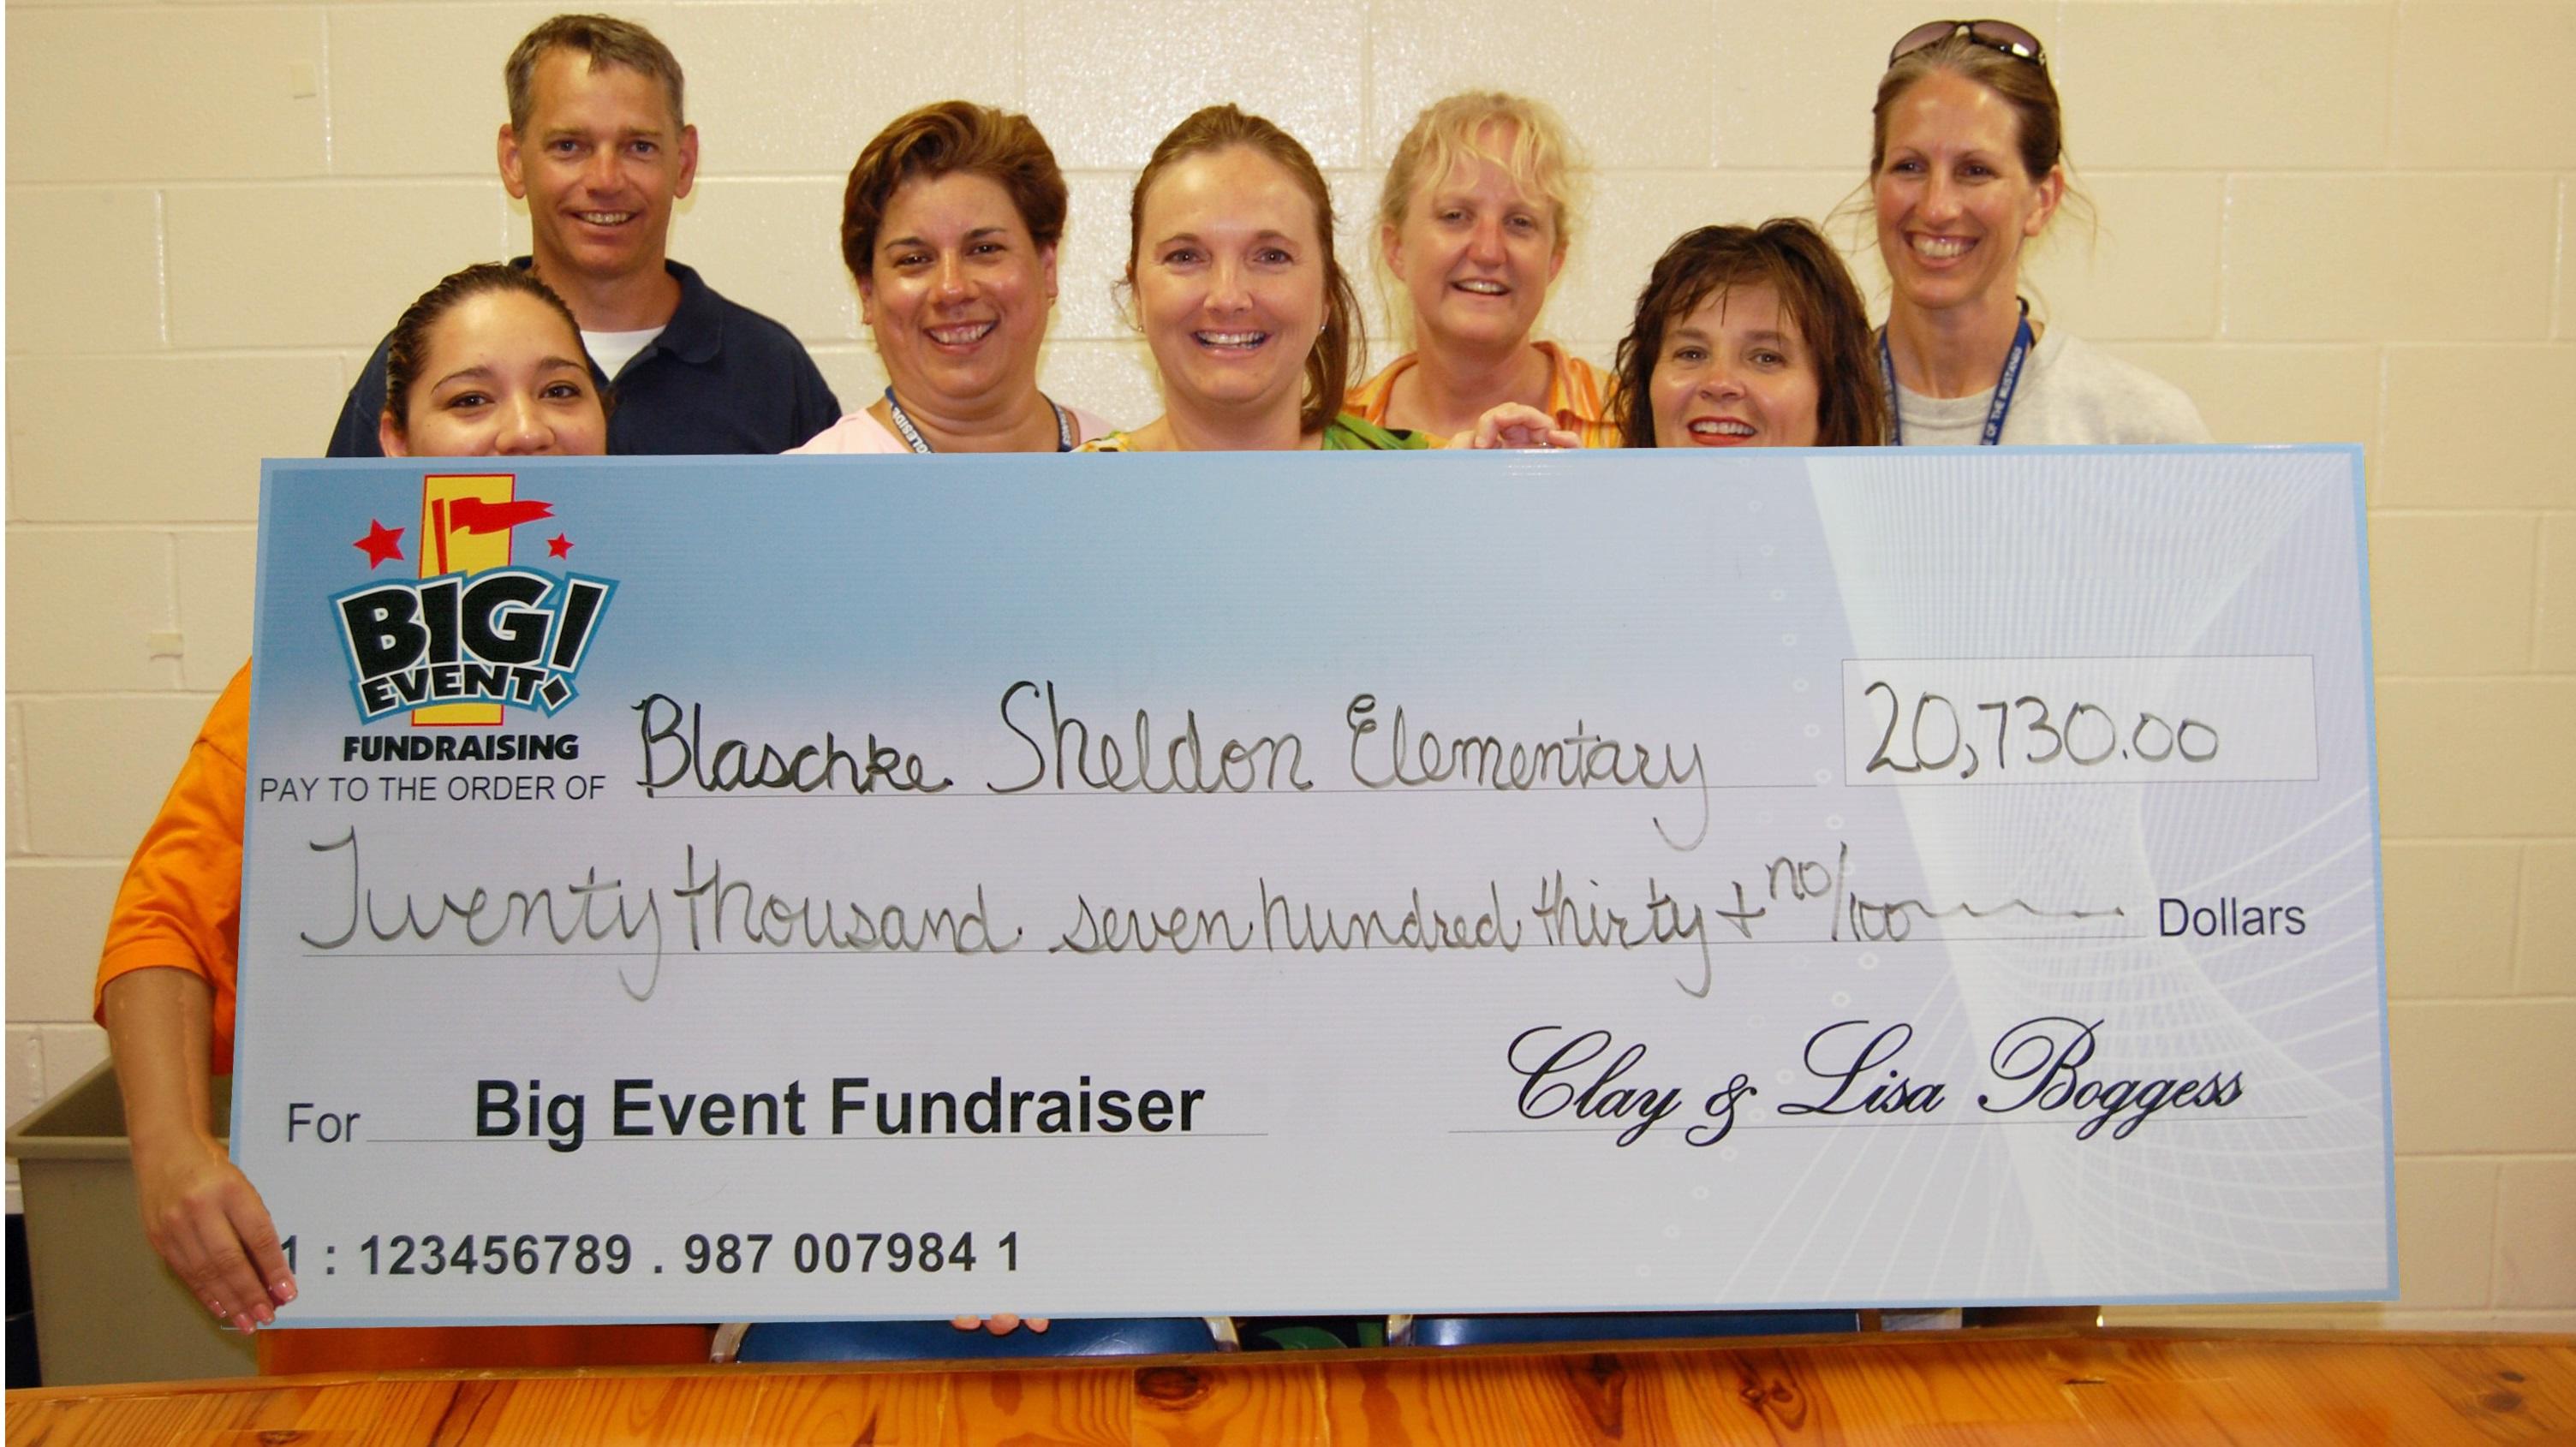 Blaschke Sheldon Elementary School fundraising team holding check